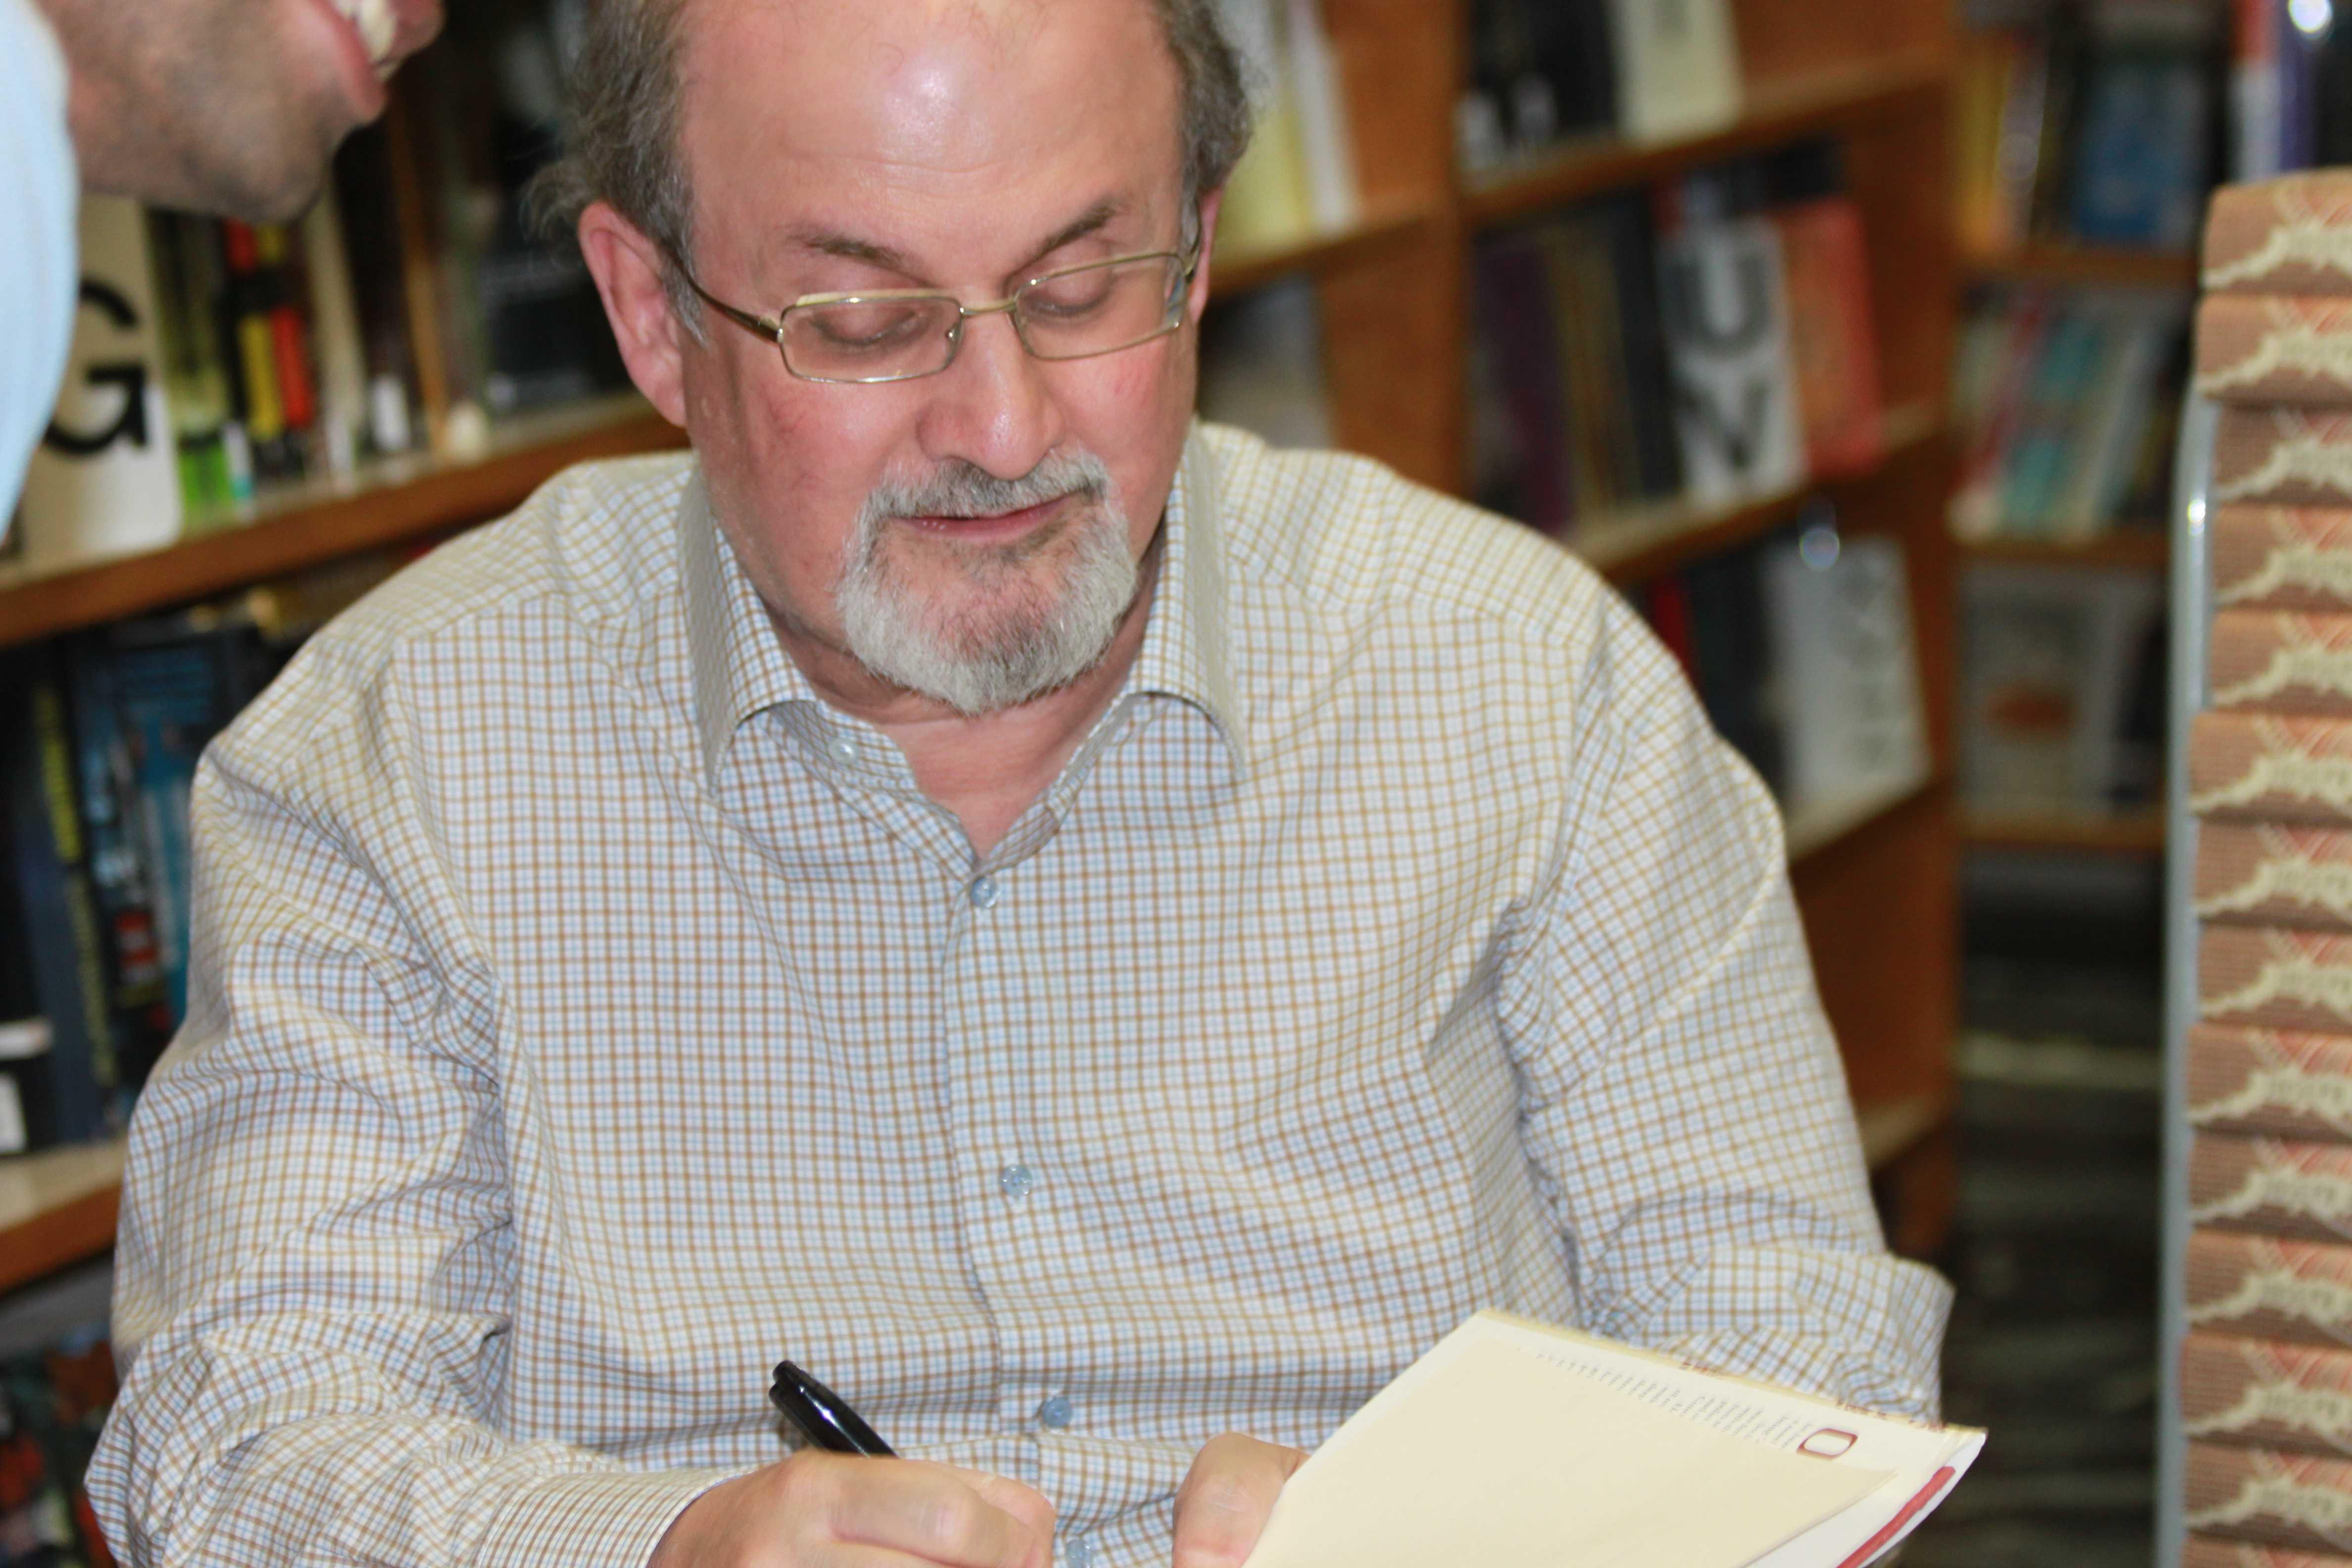 Salman Rushdie offers international scope in local visit